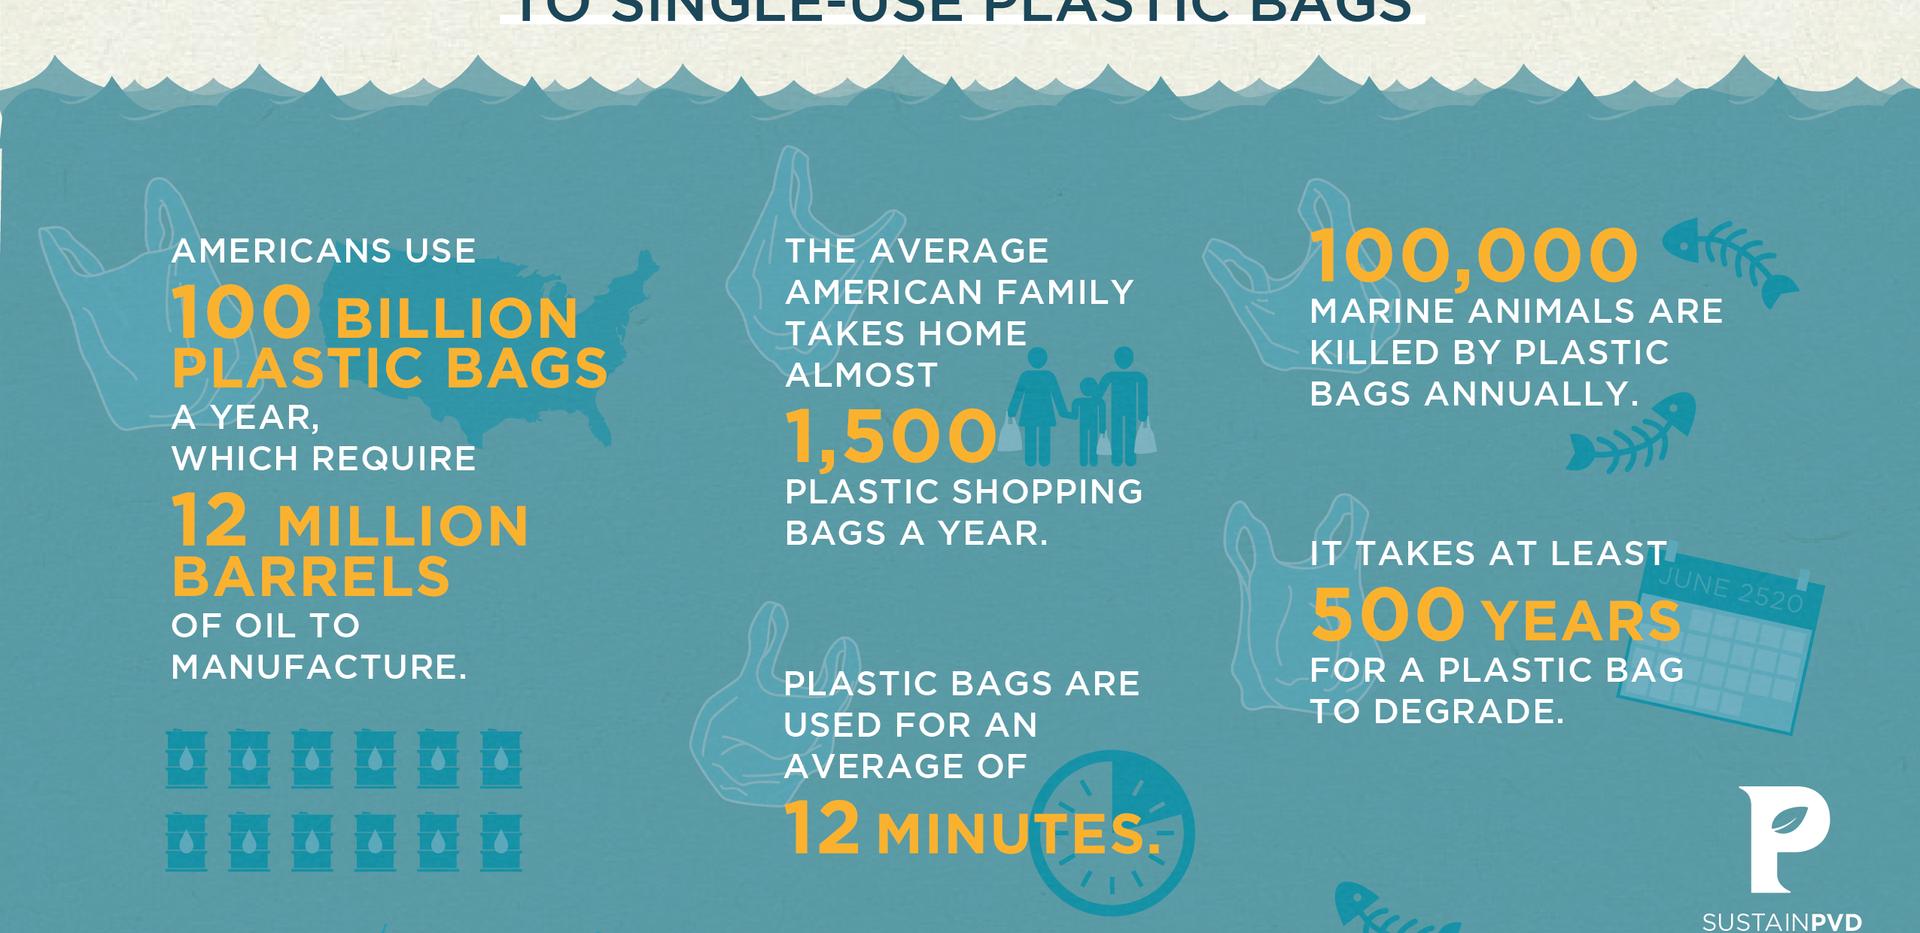 Plastic Bag Ban Inofgraphic